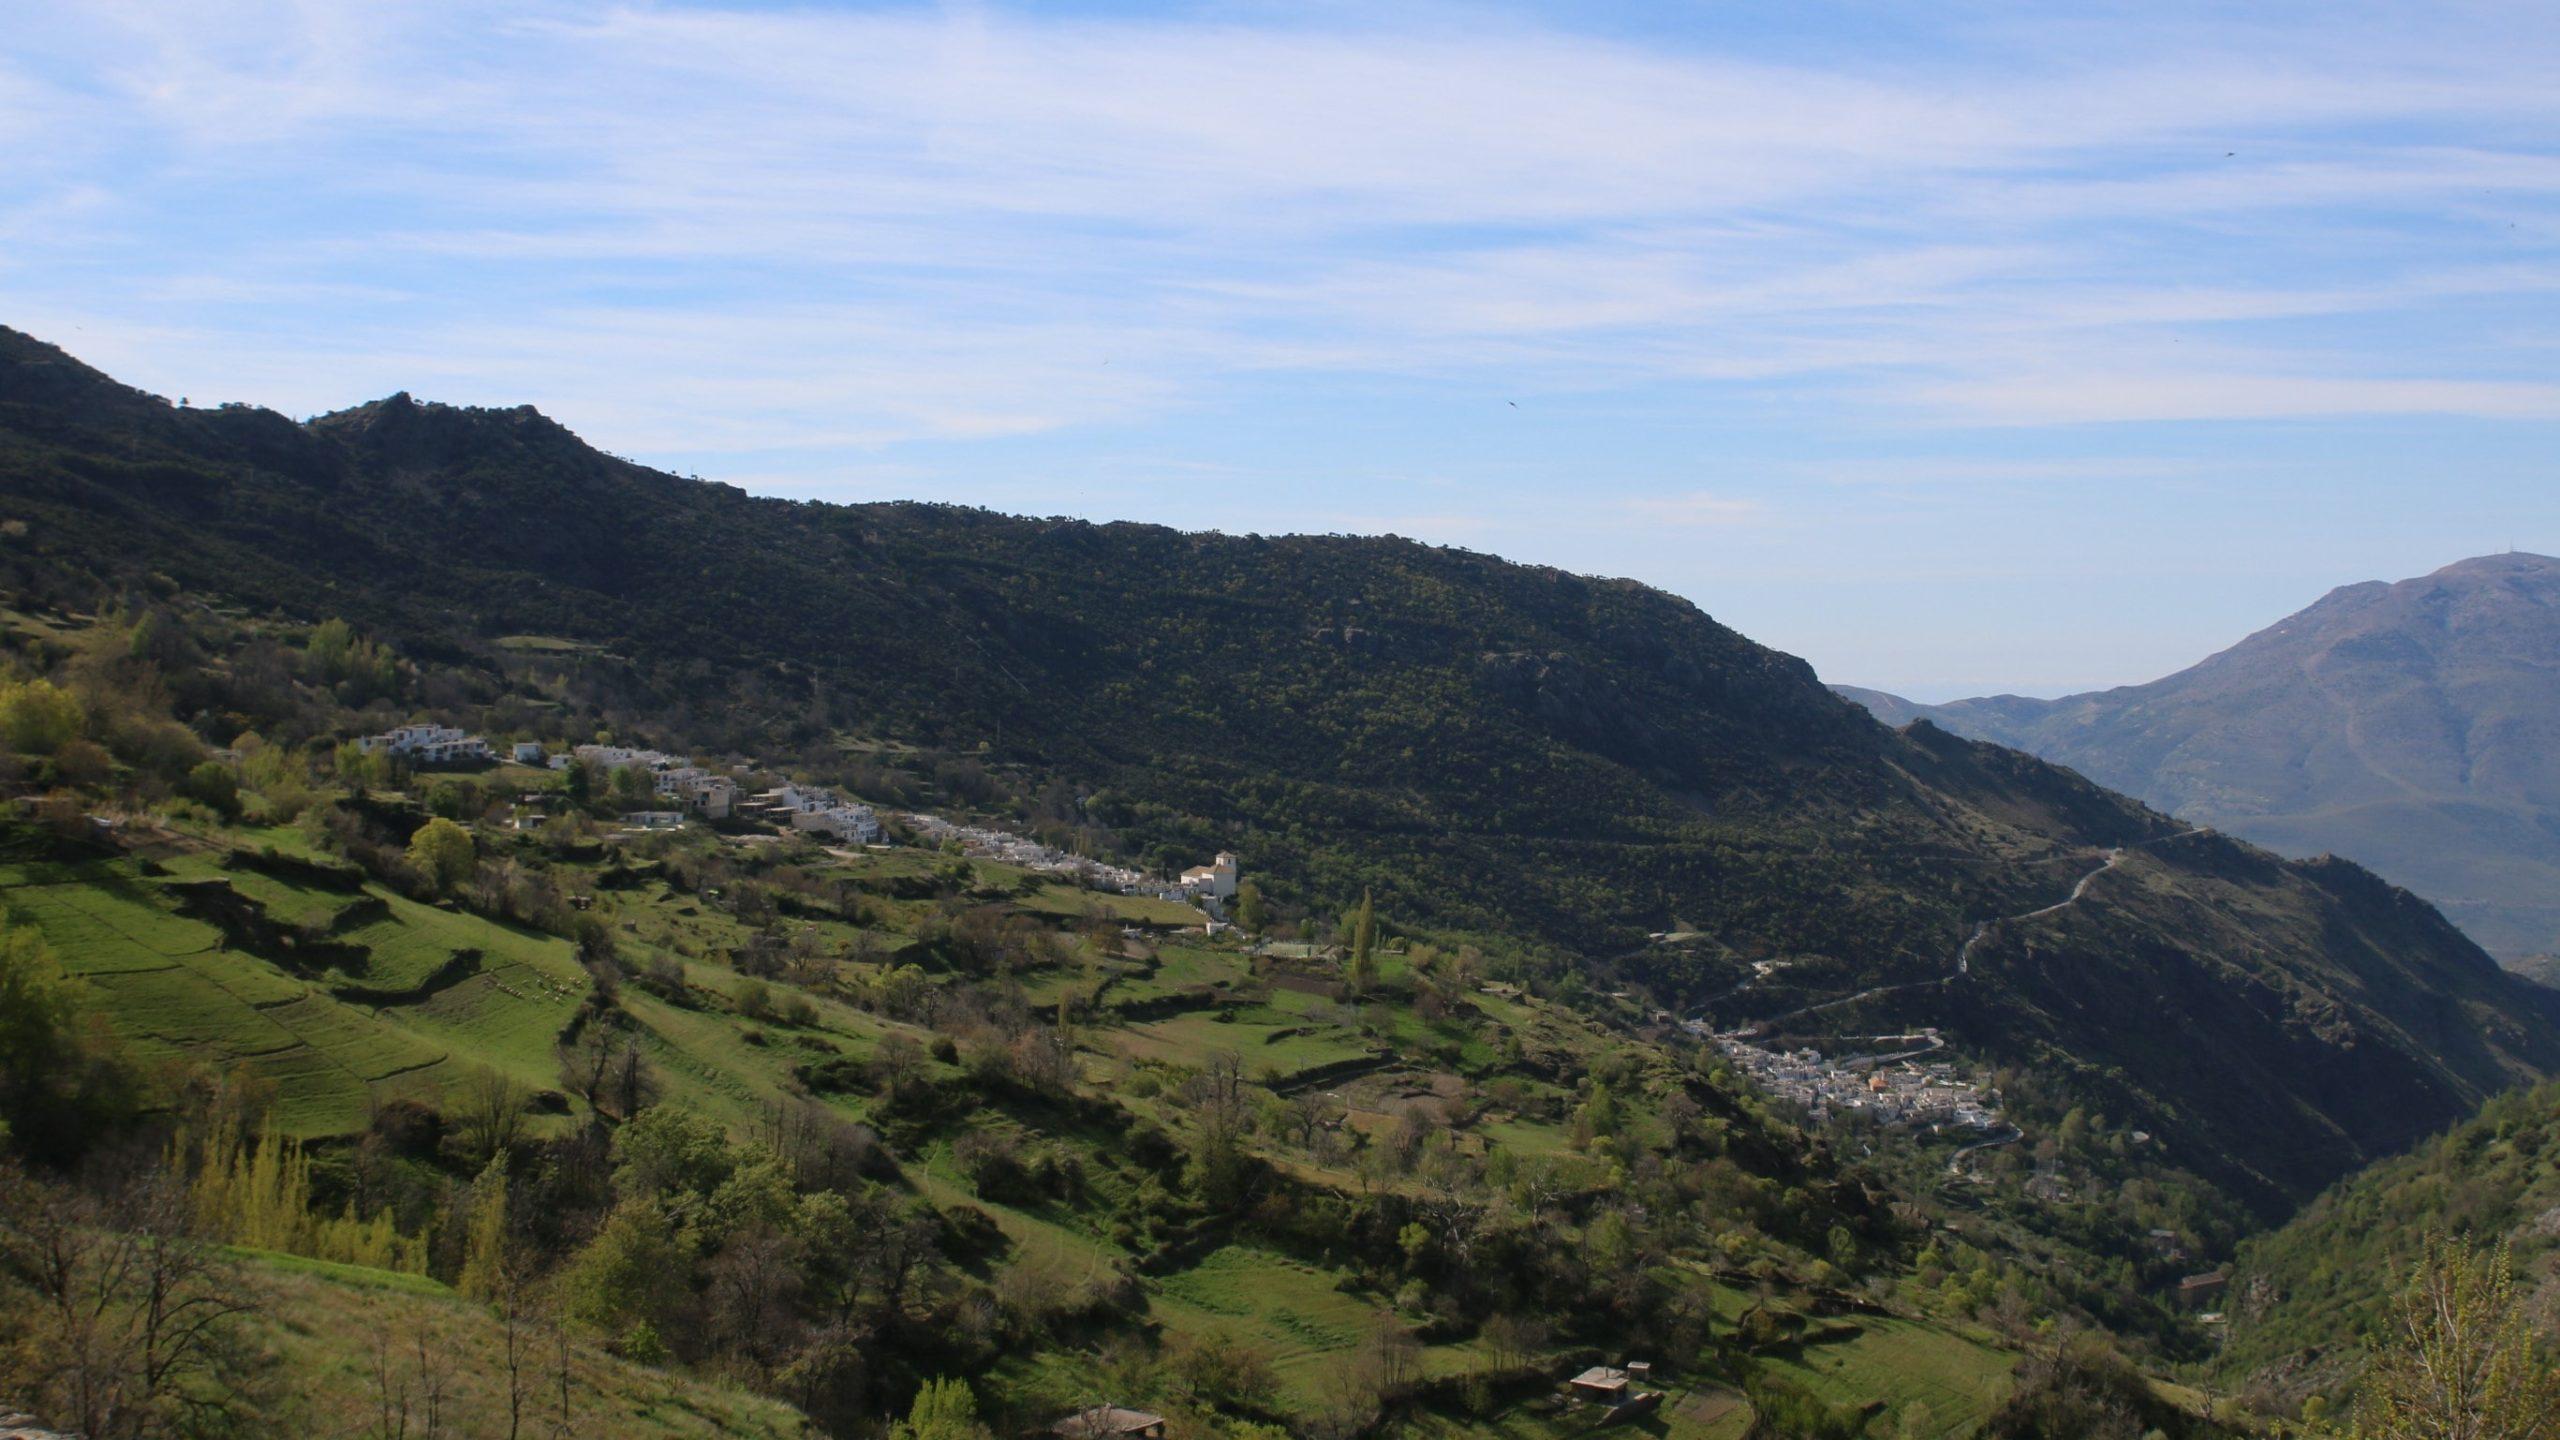 Rich results on google SERP when seaching for Barranco del Poqueira